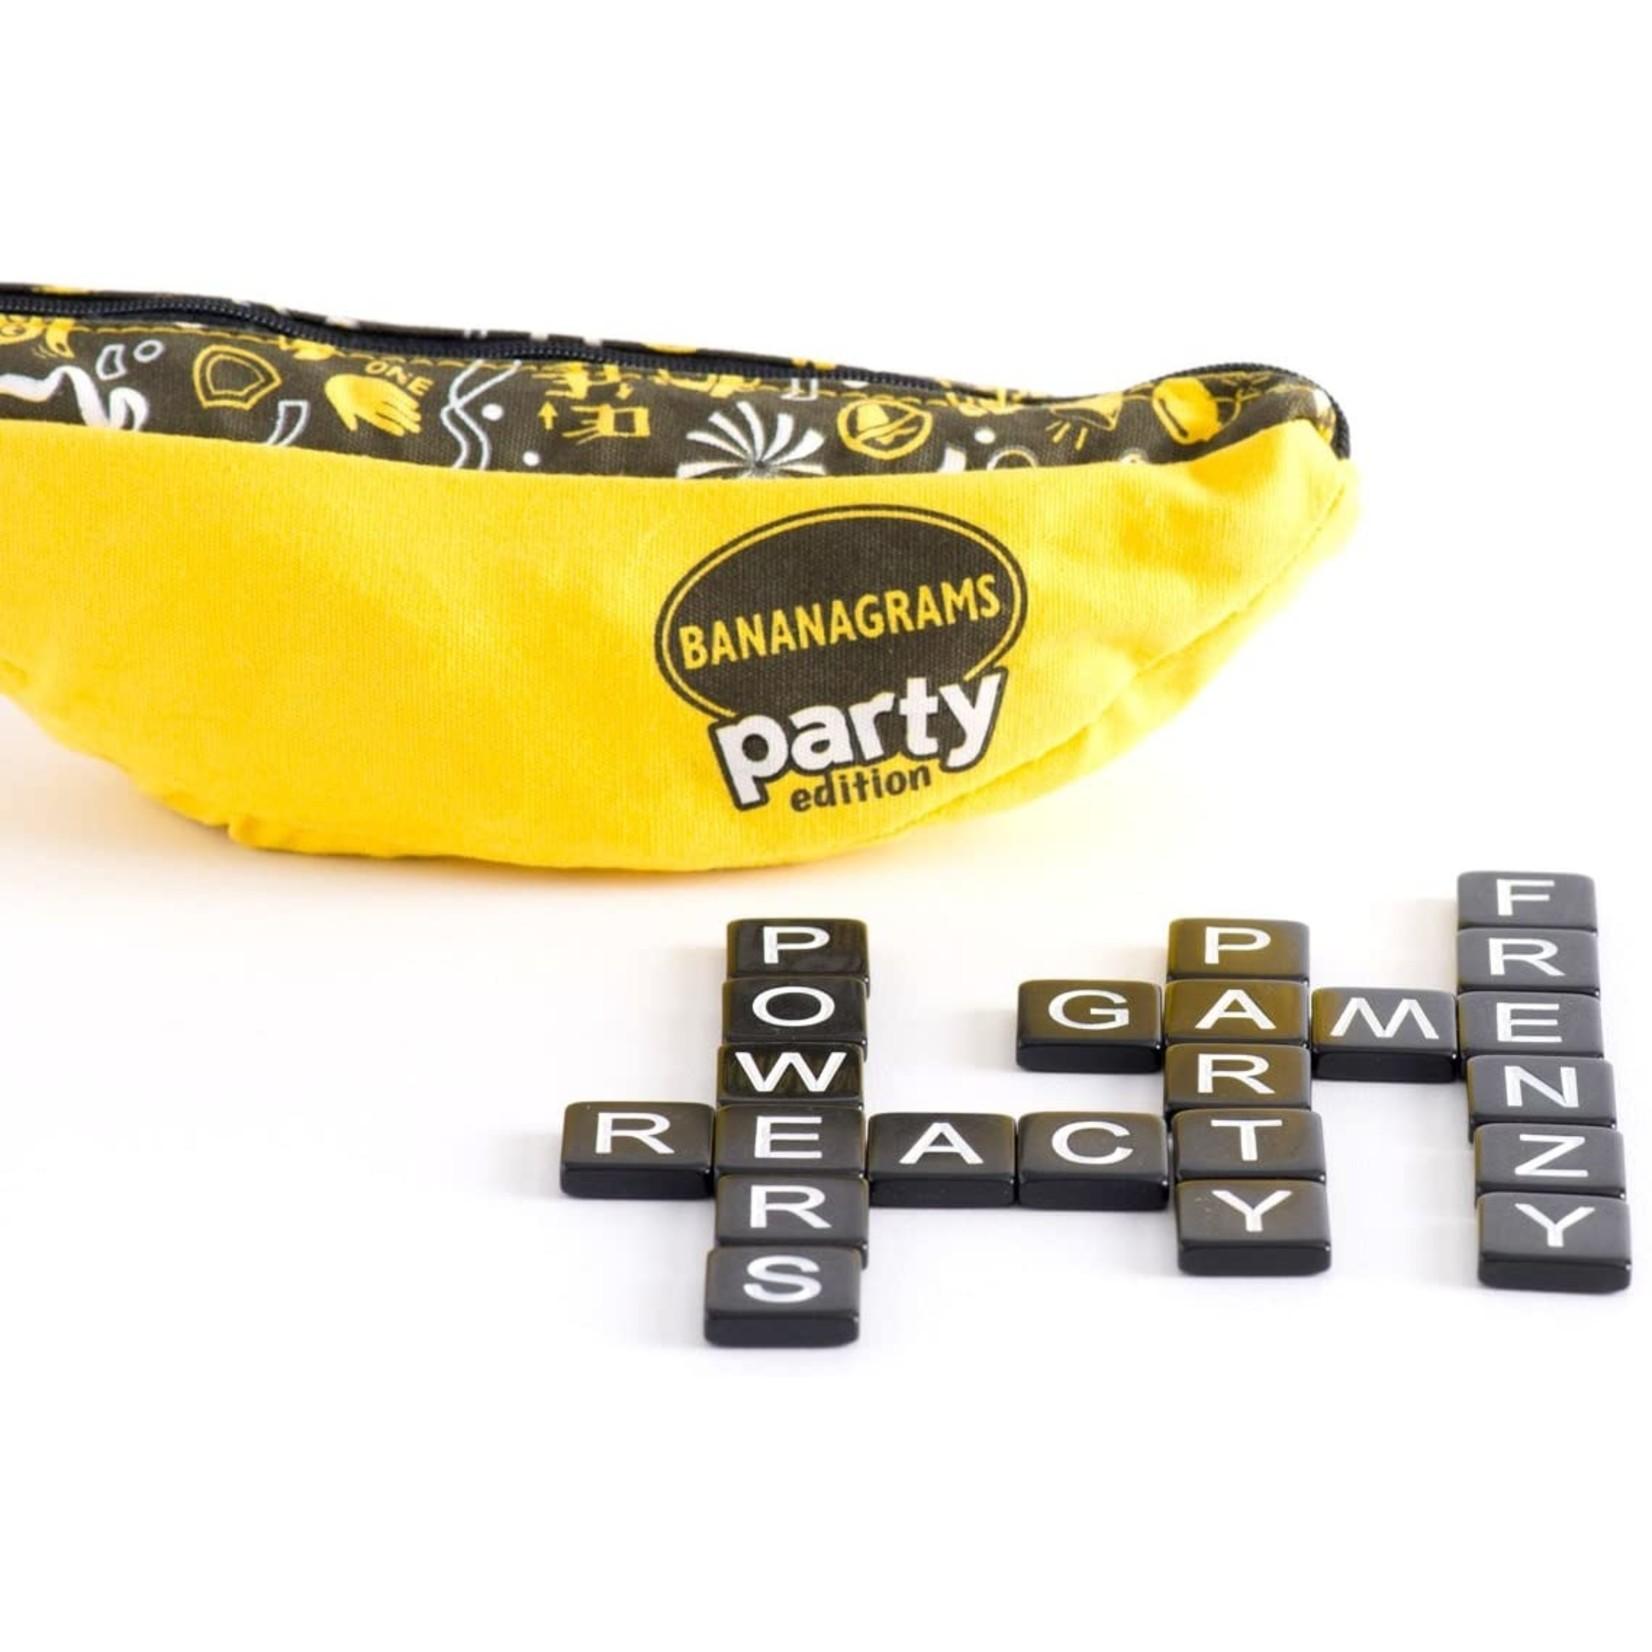 Bananagrams Bananagrams Party Edition